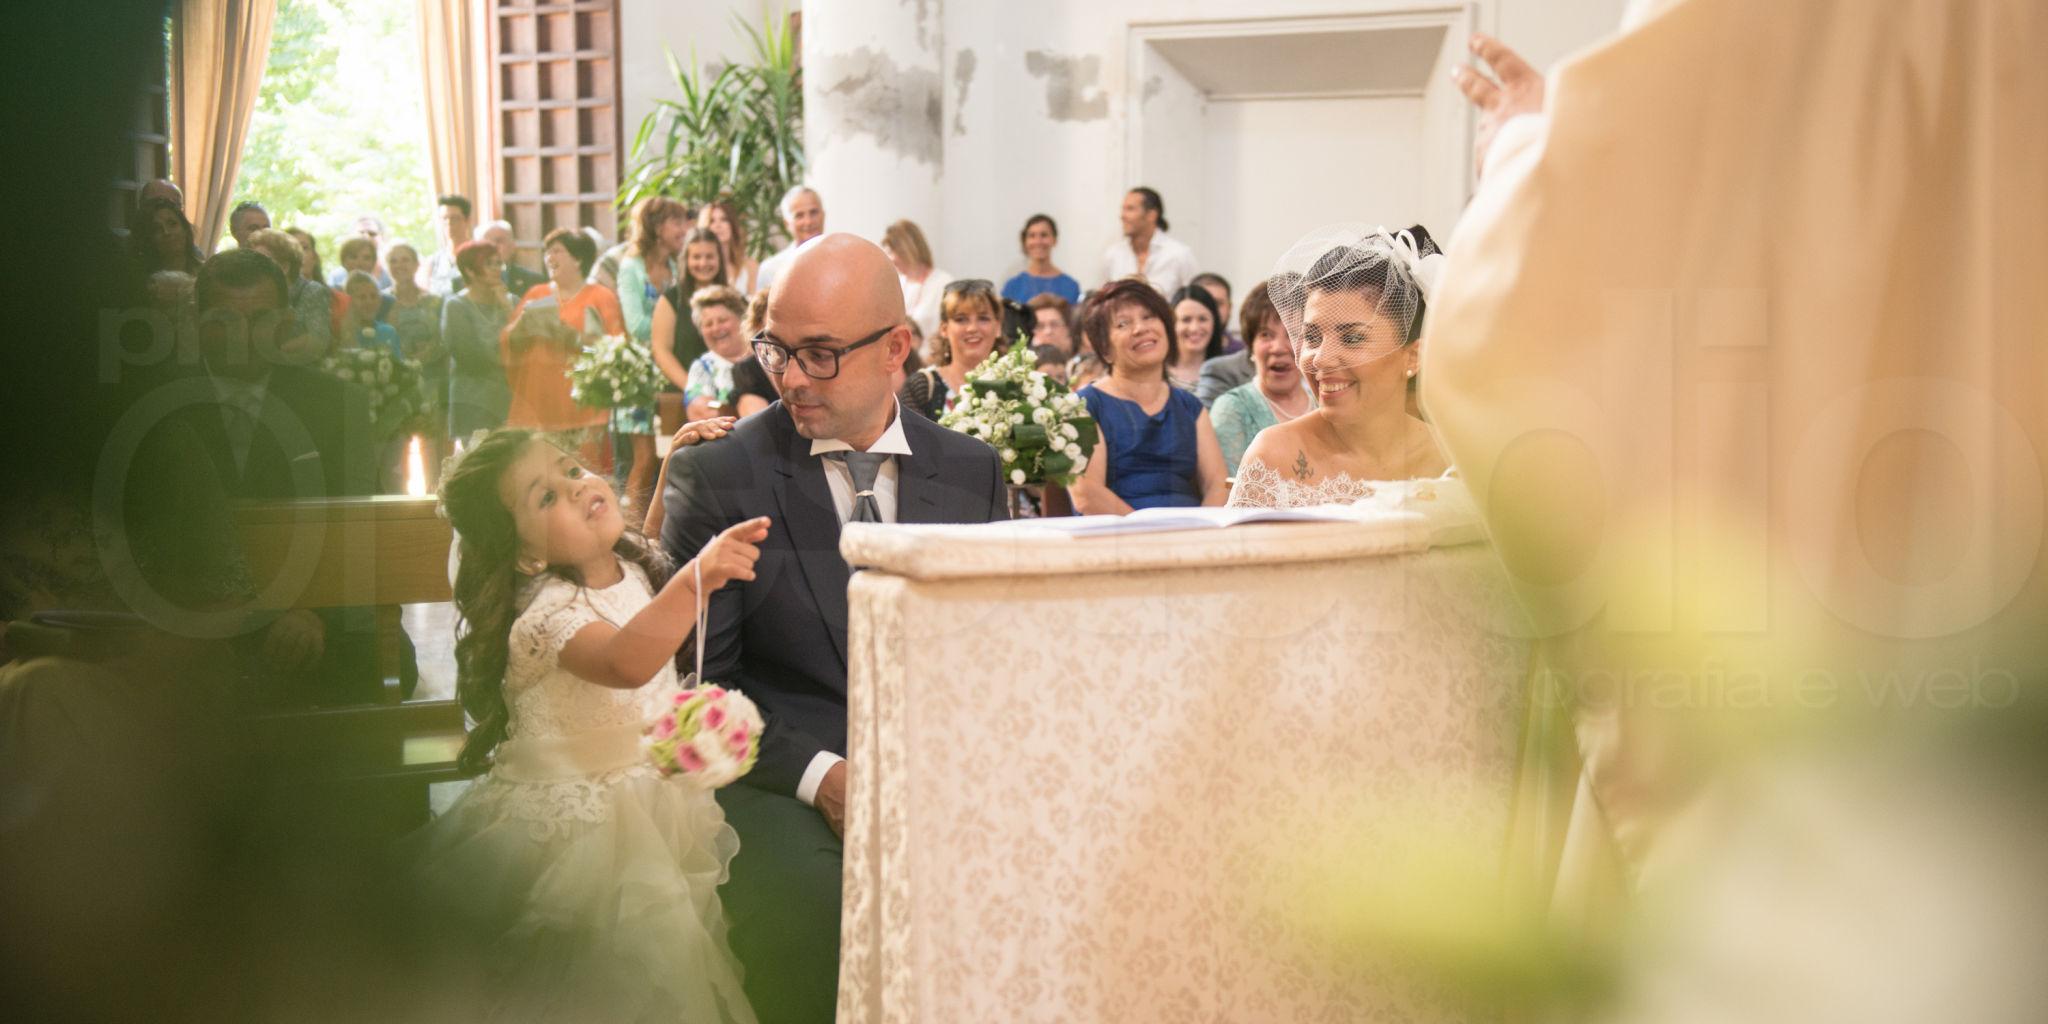 http://lnx.mirkone.it/wp-content/uploads/2015/07/fotografo-matrimoni-faenza-cerimonia-0019.jpg